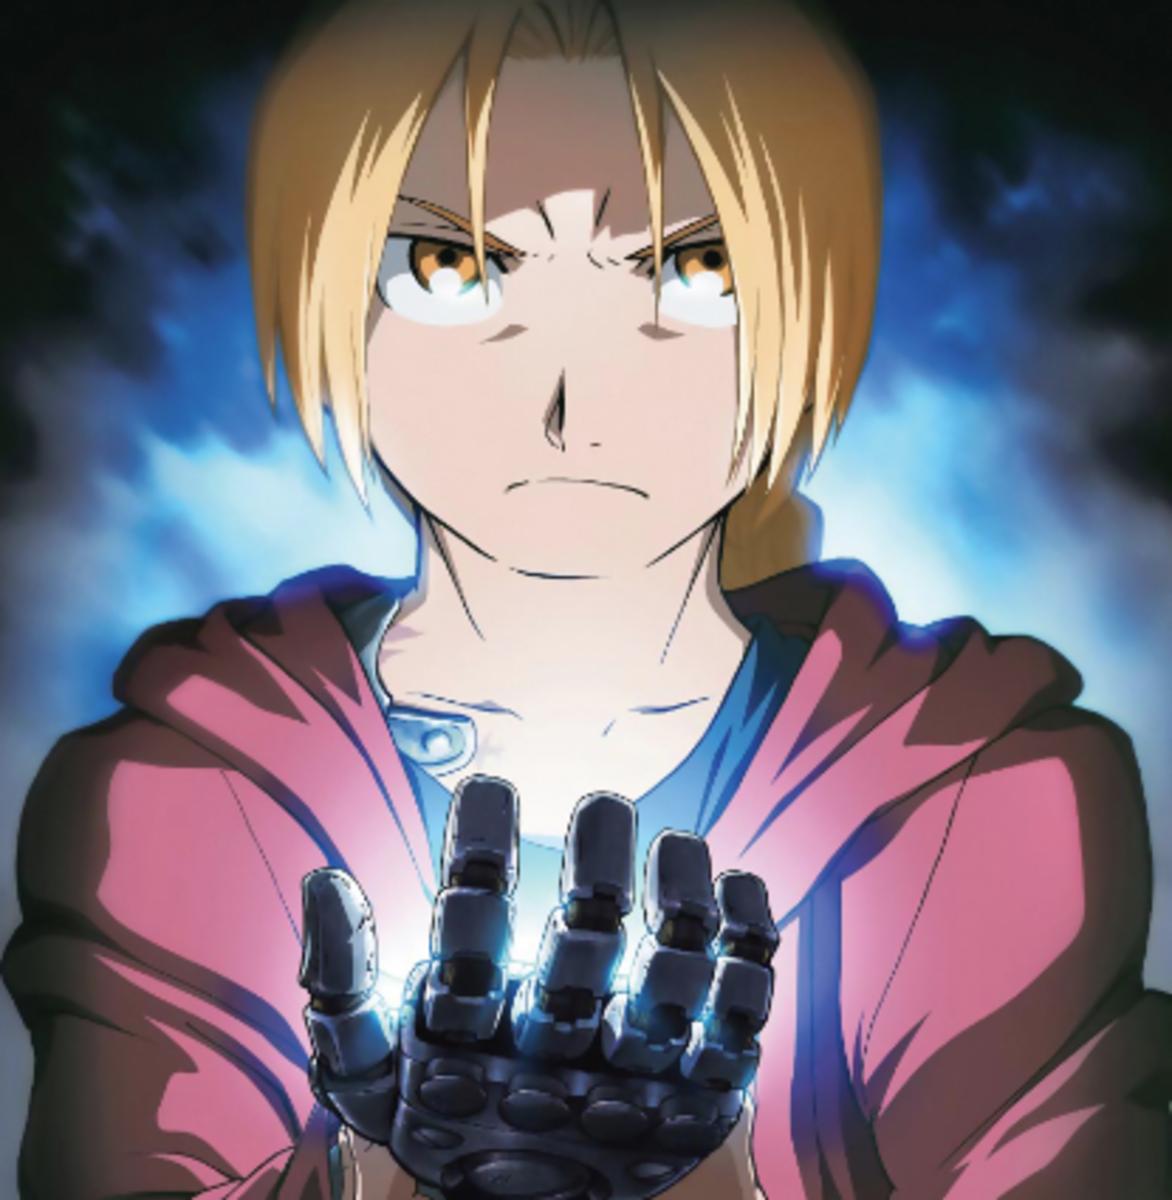 Edward Elric from 'Fullmetal Alchemist: Brotherhood.'